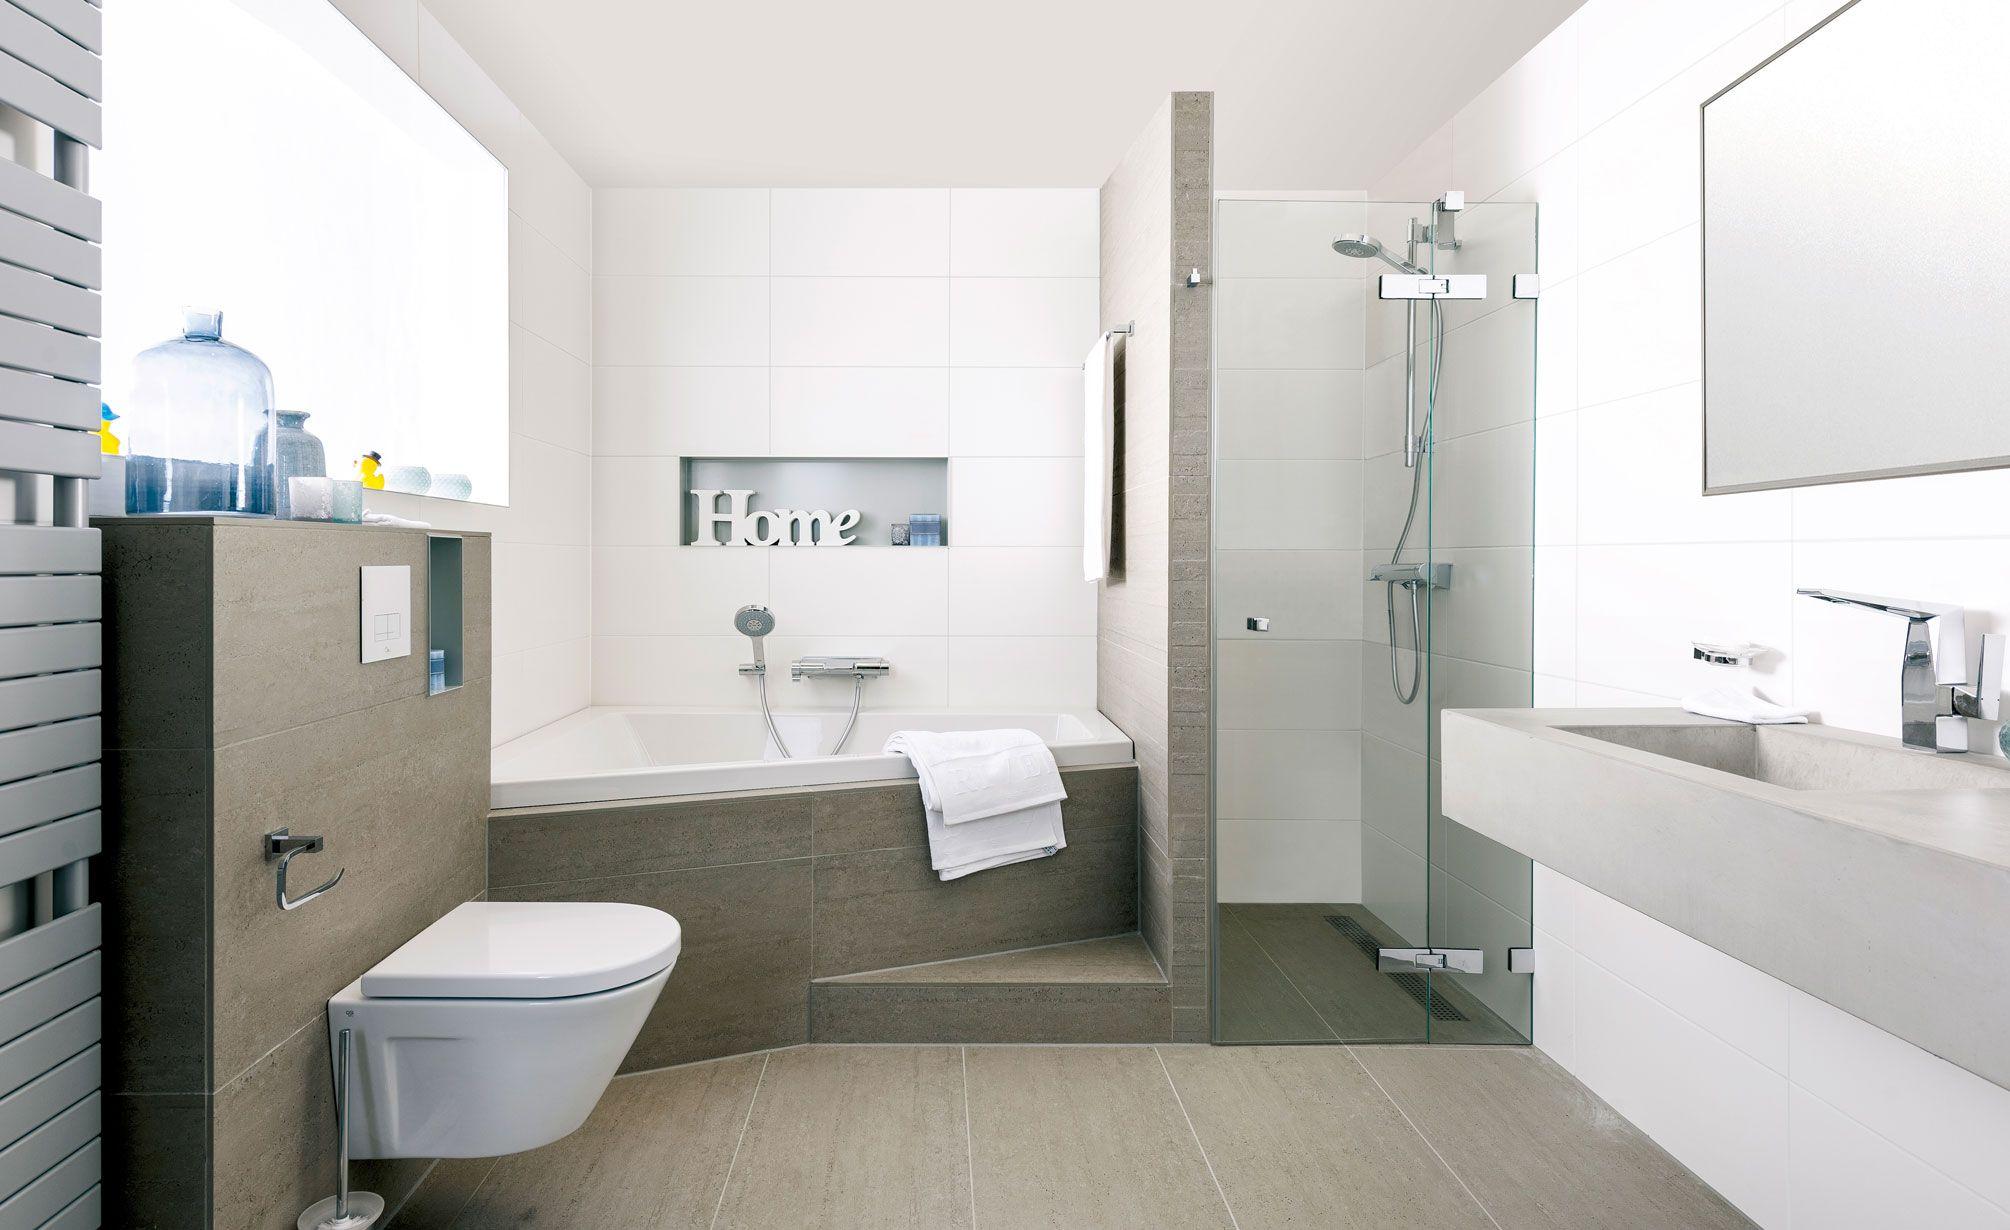 Matte Tegels Badkamer | Interieur | Pinterest | Badezimmer, Bad und ...